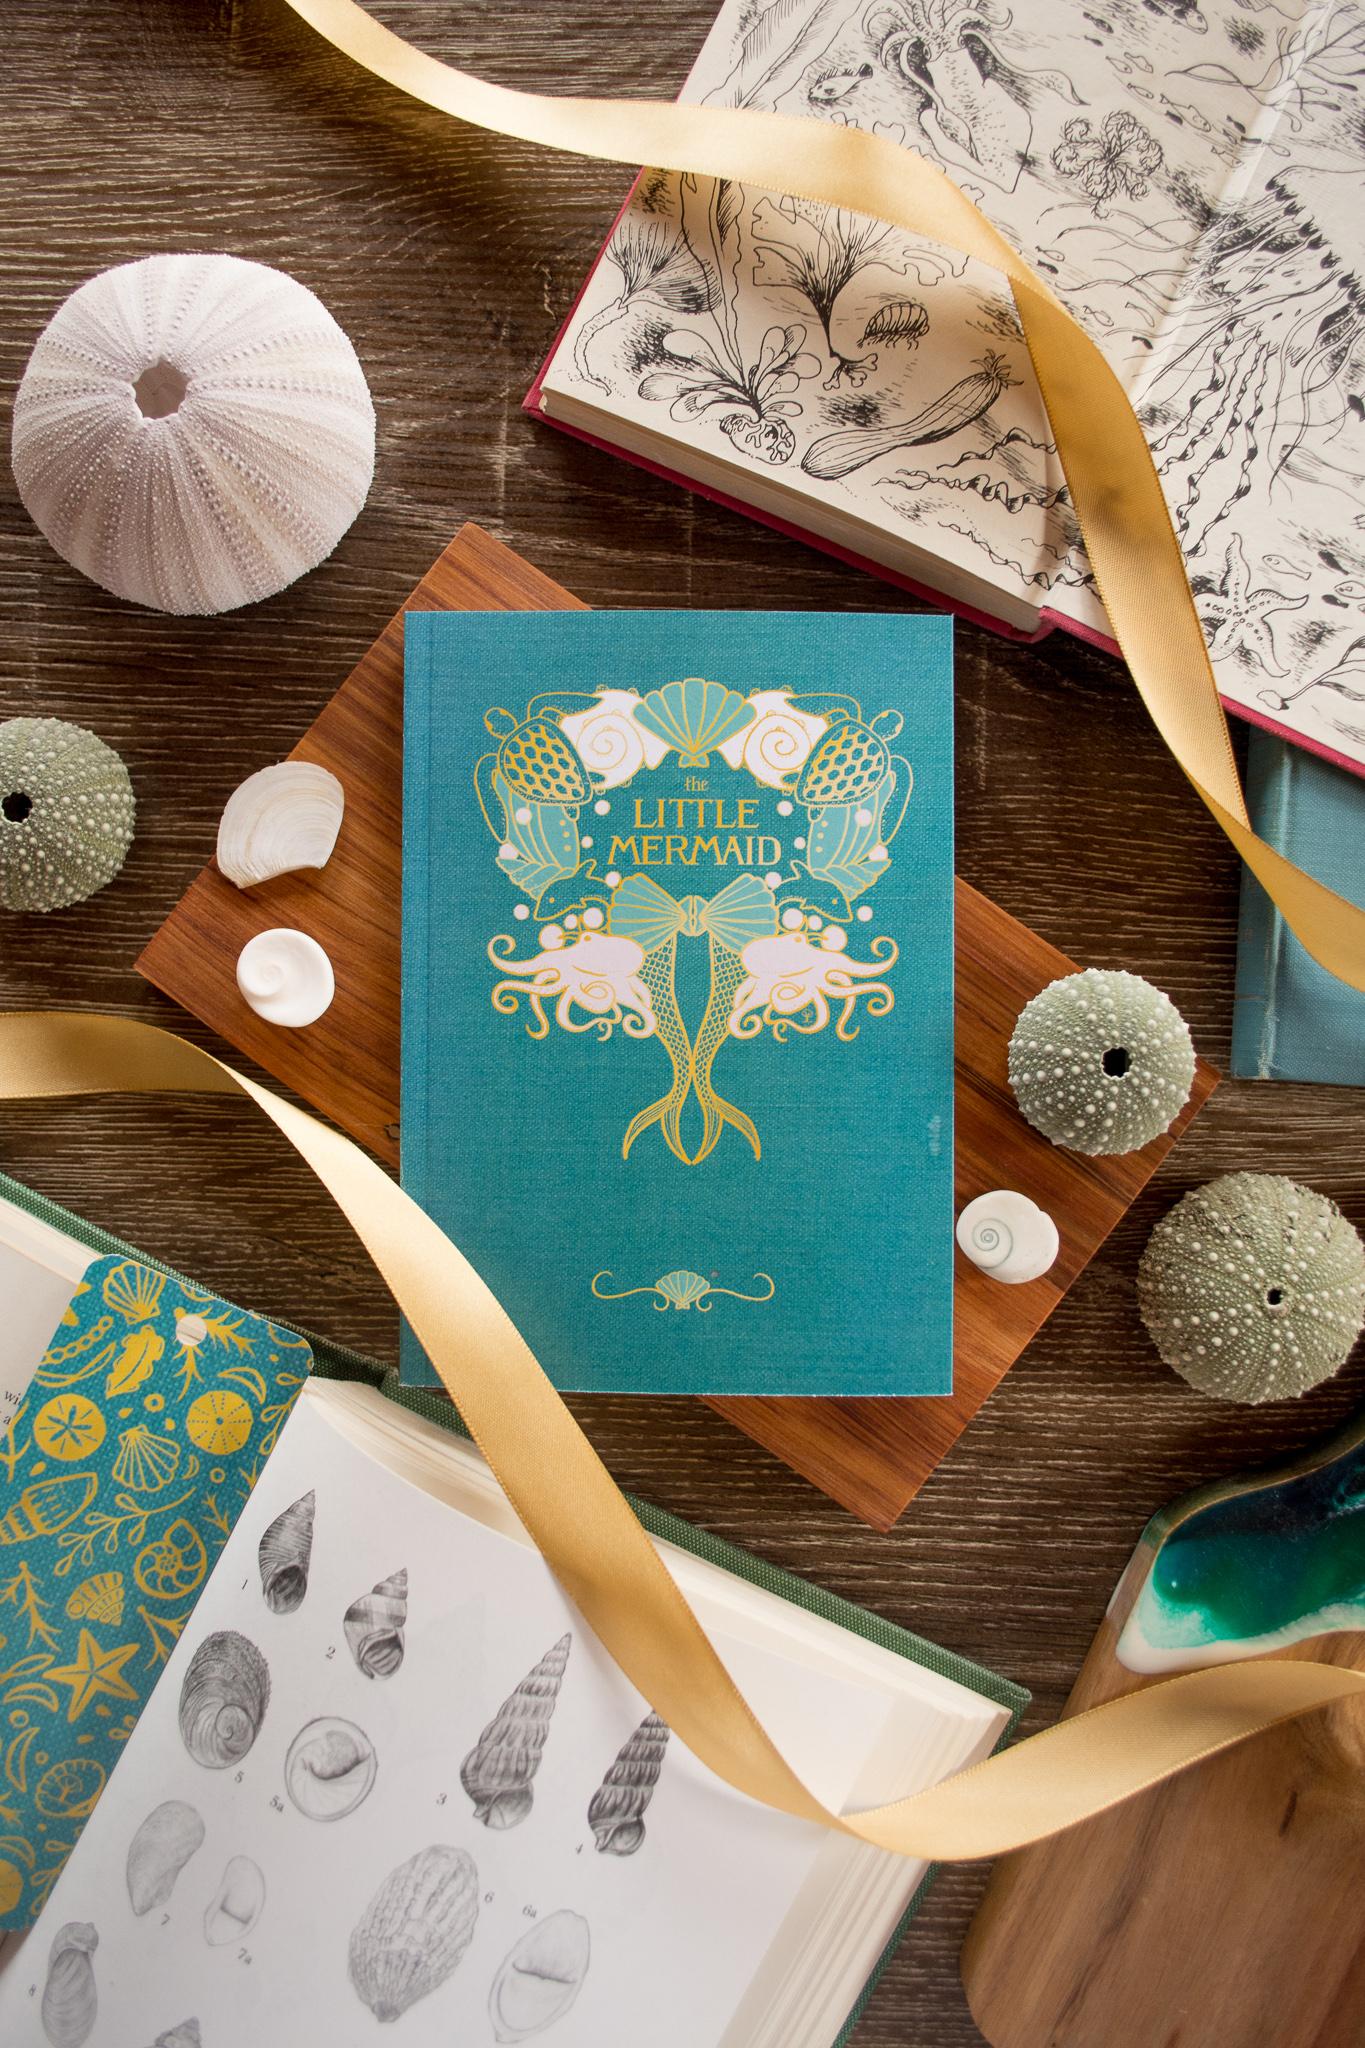 little_mermaid_notebook_cover_book_holly_dunn_design.jpg